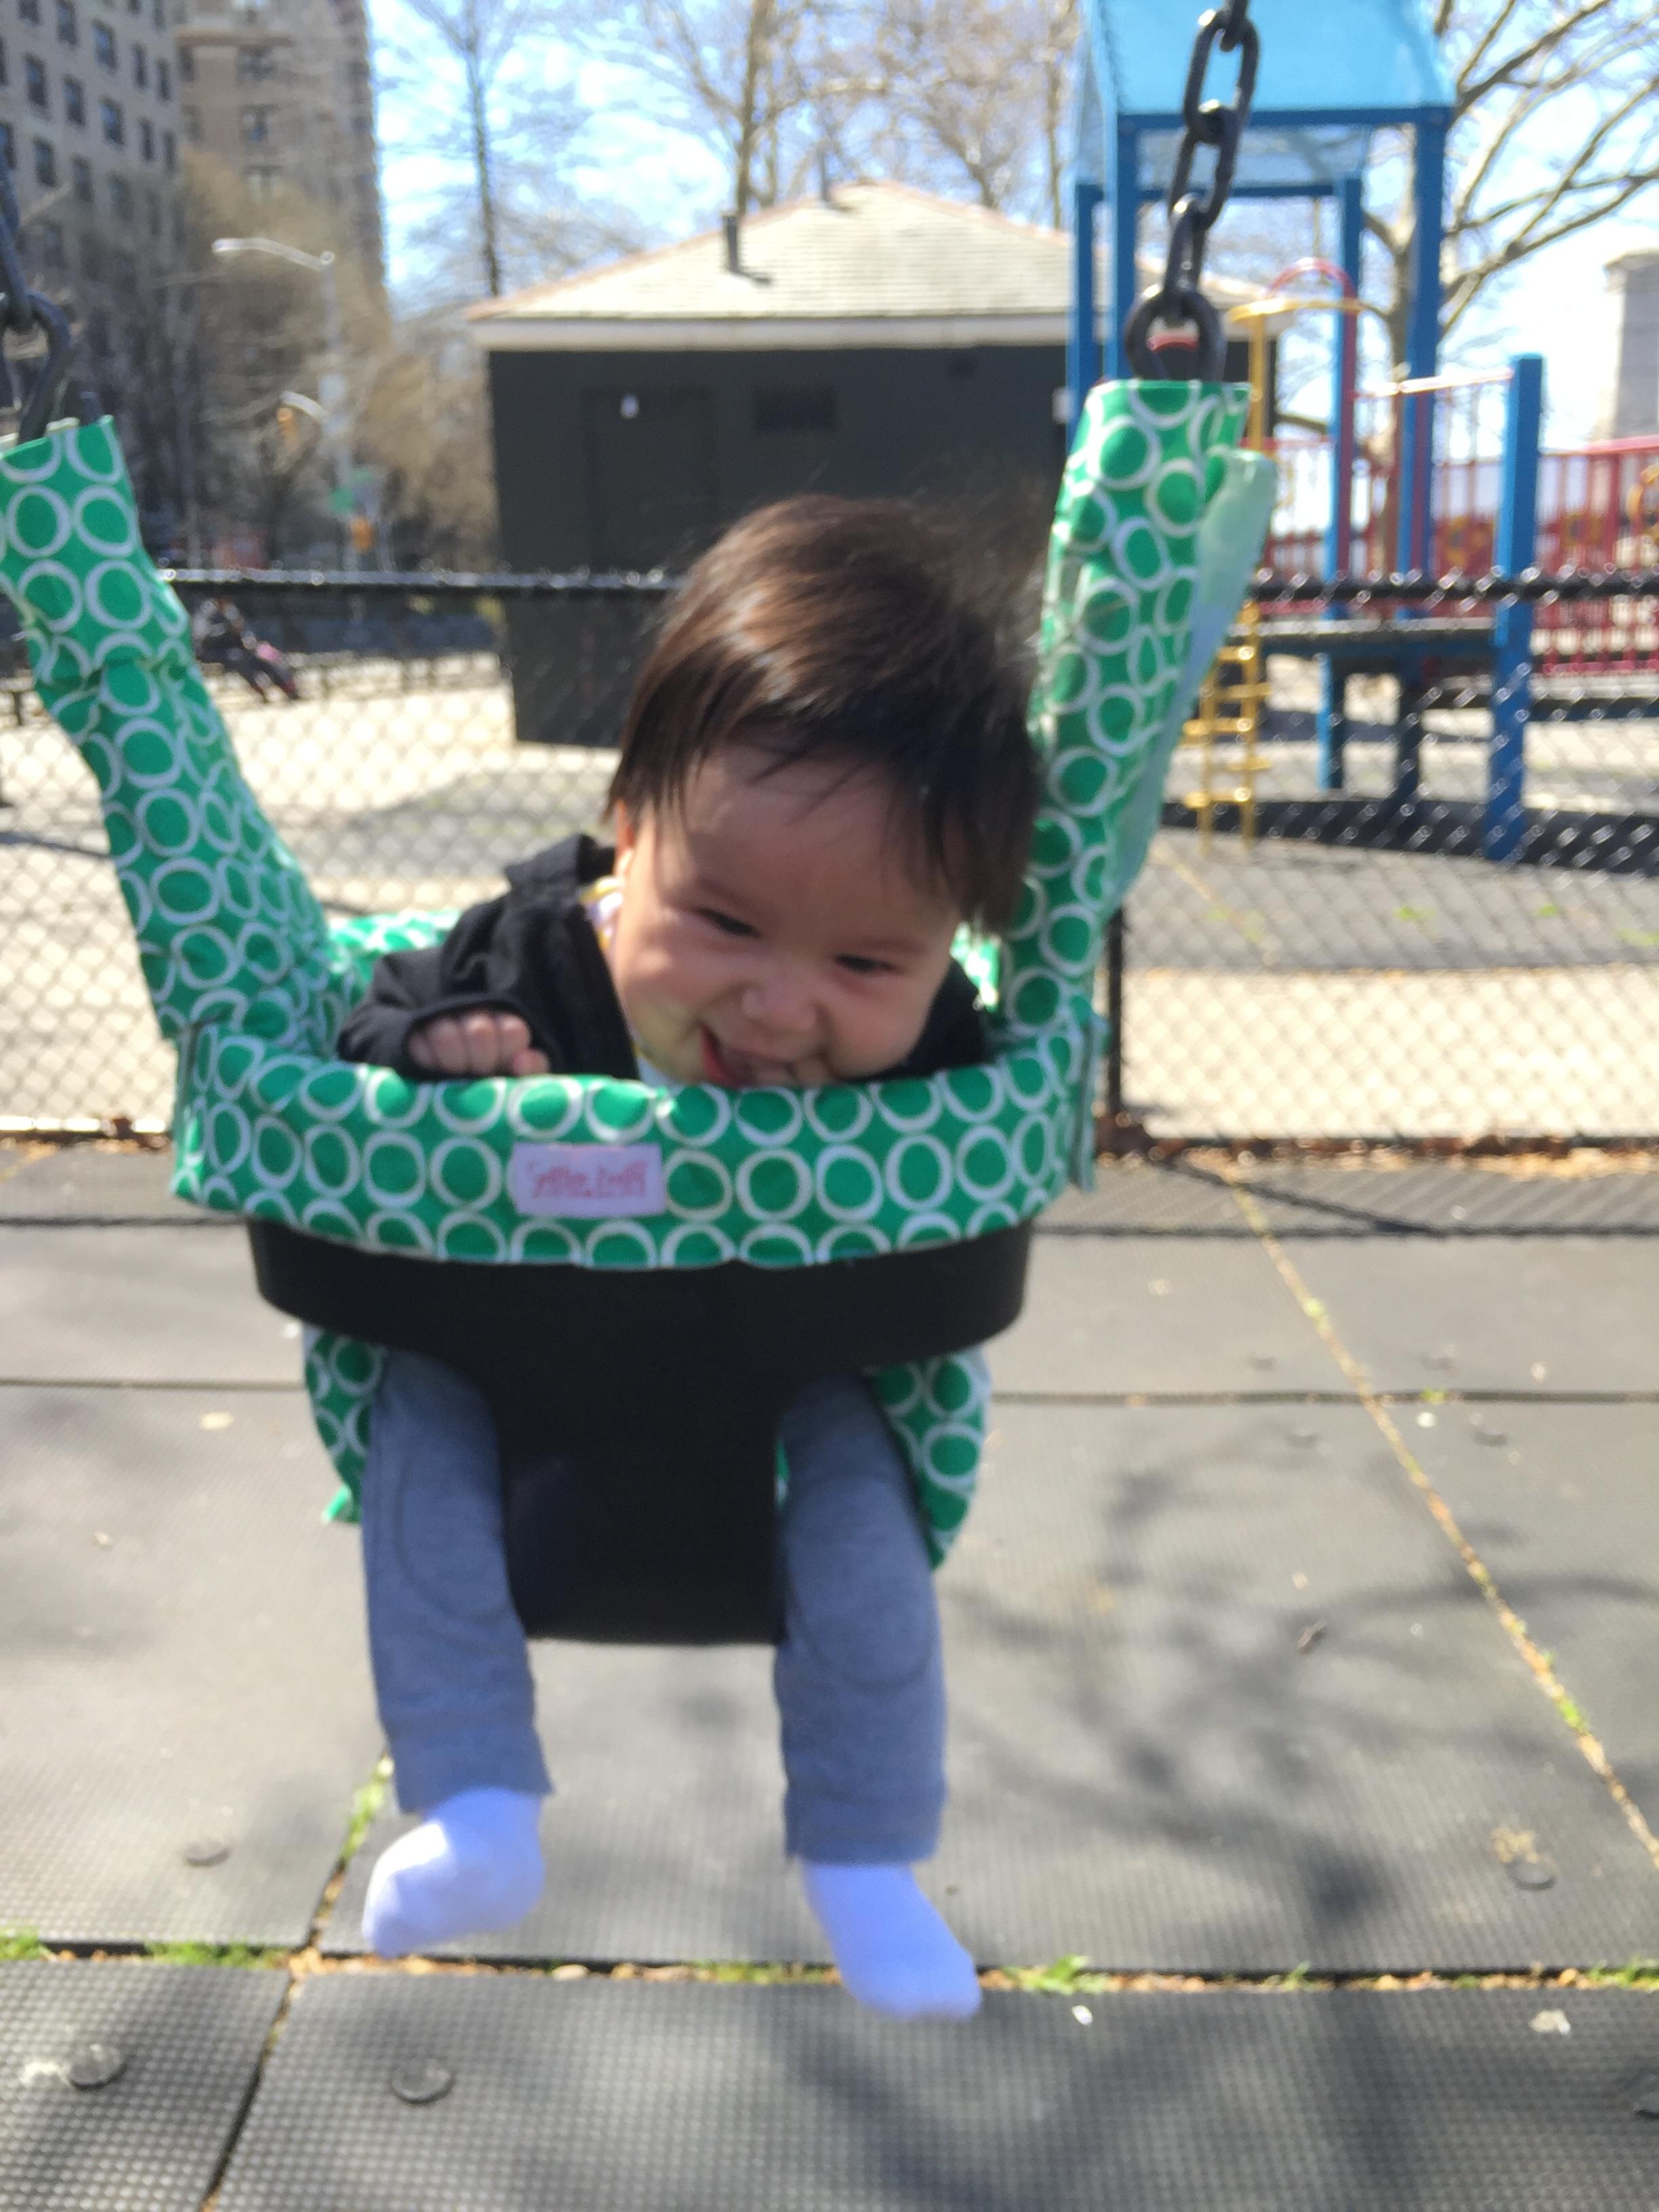 He loves the swings now!